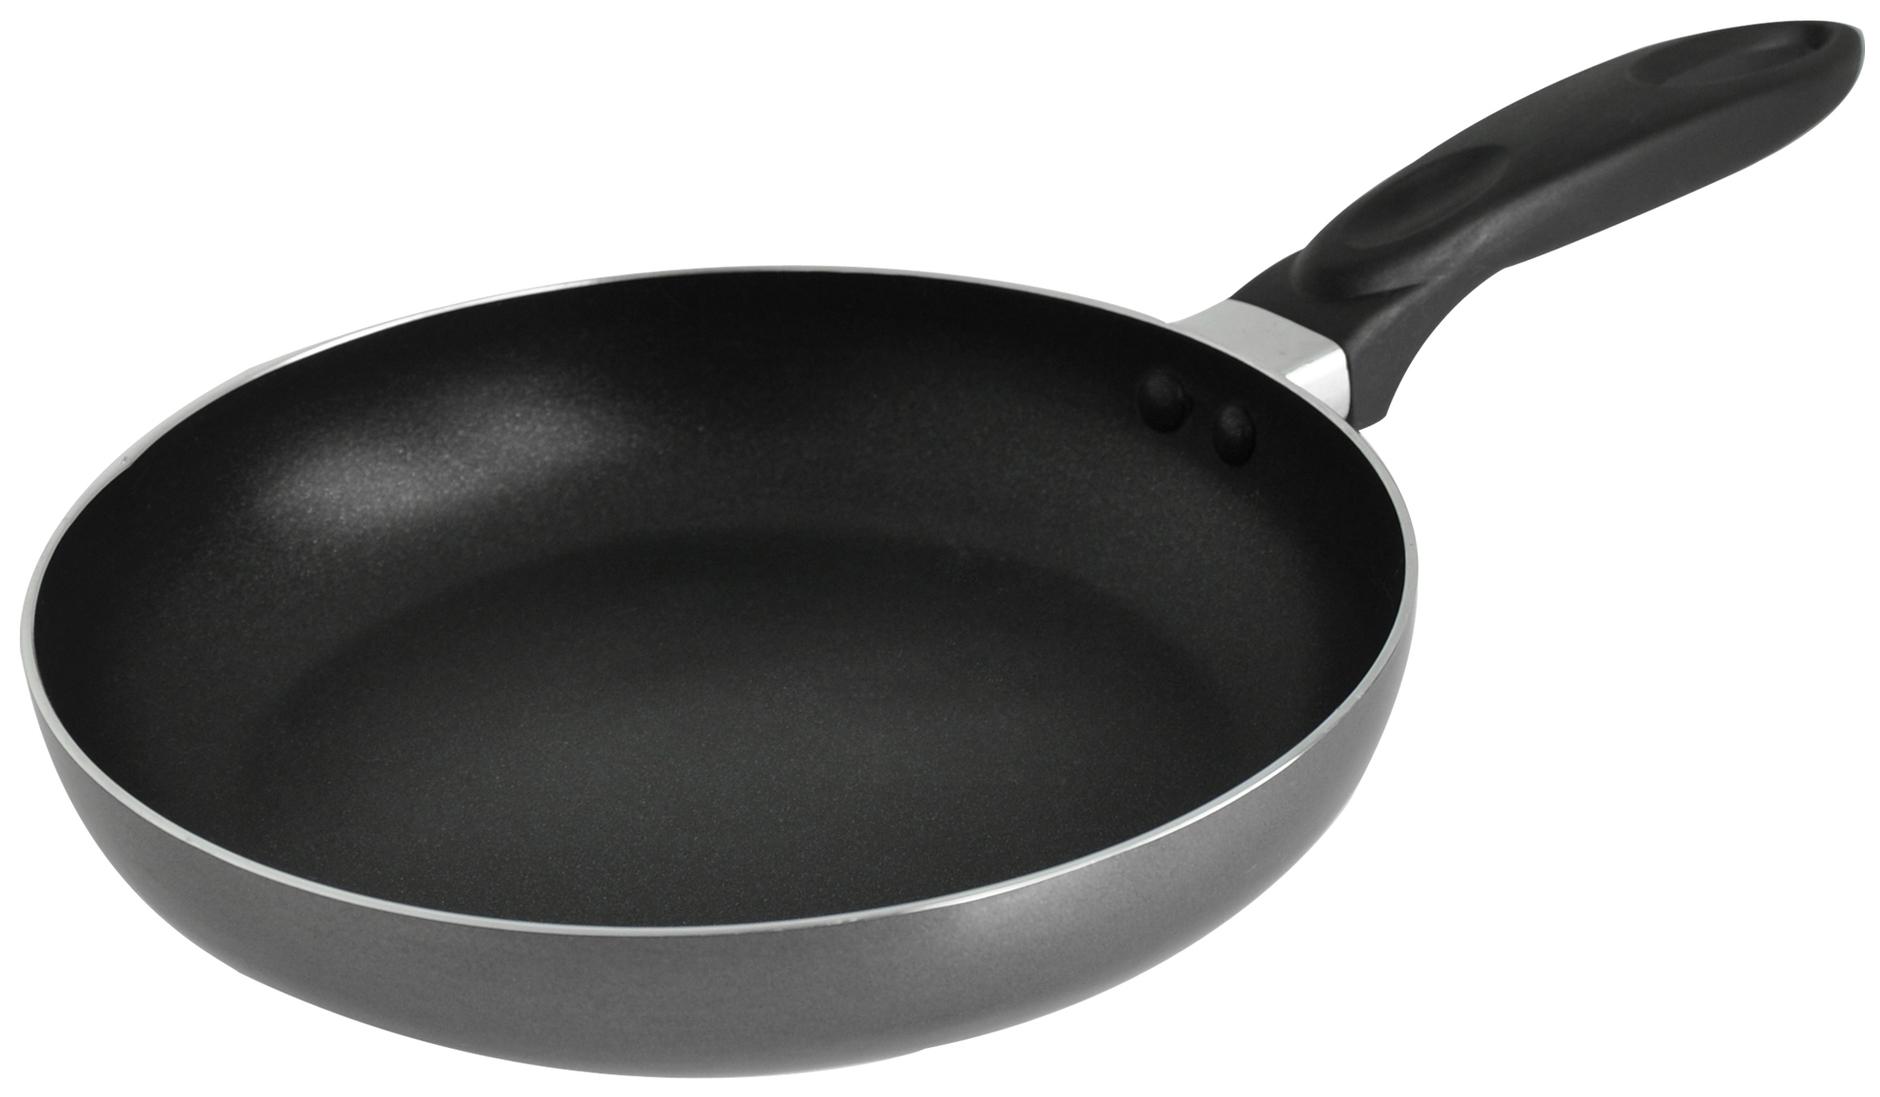 Сковорода REGENT inox 93-AL-FI-1-22 22 см